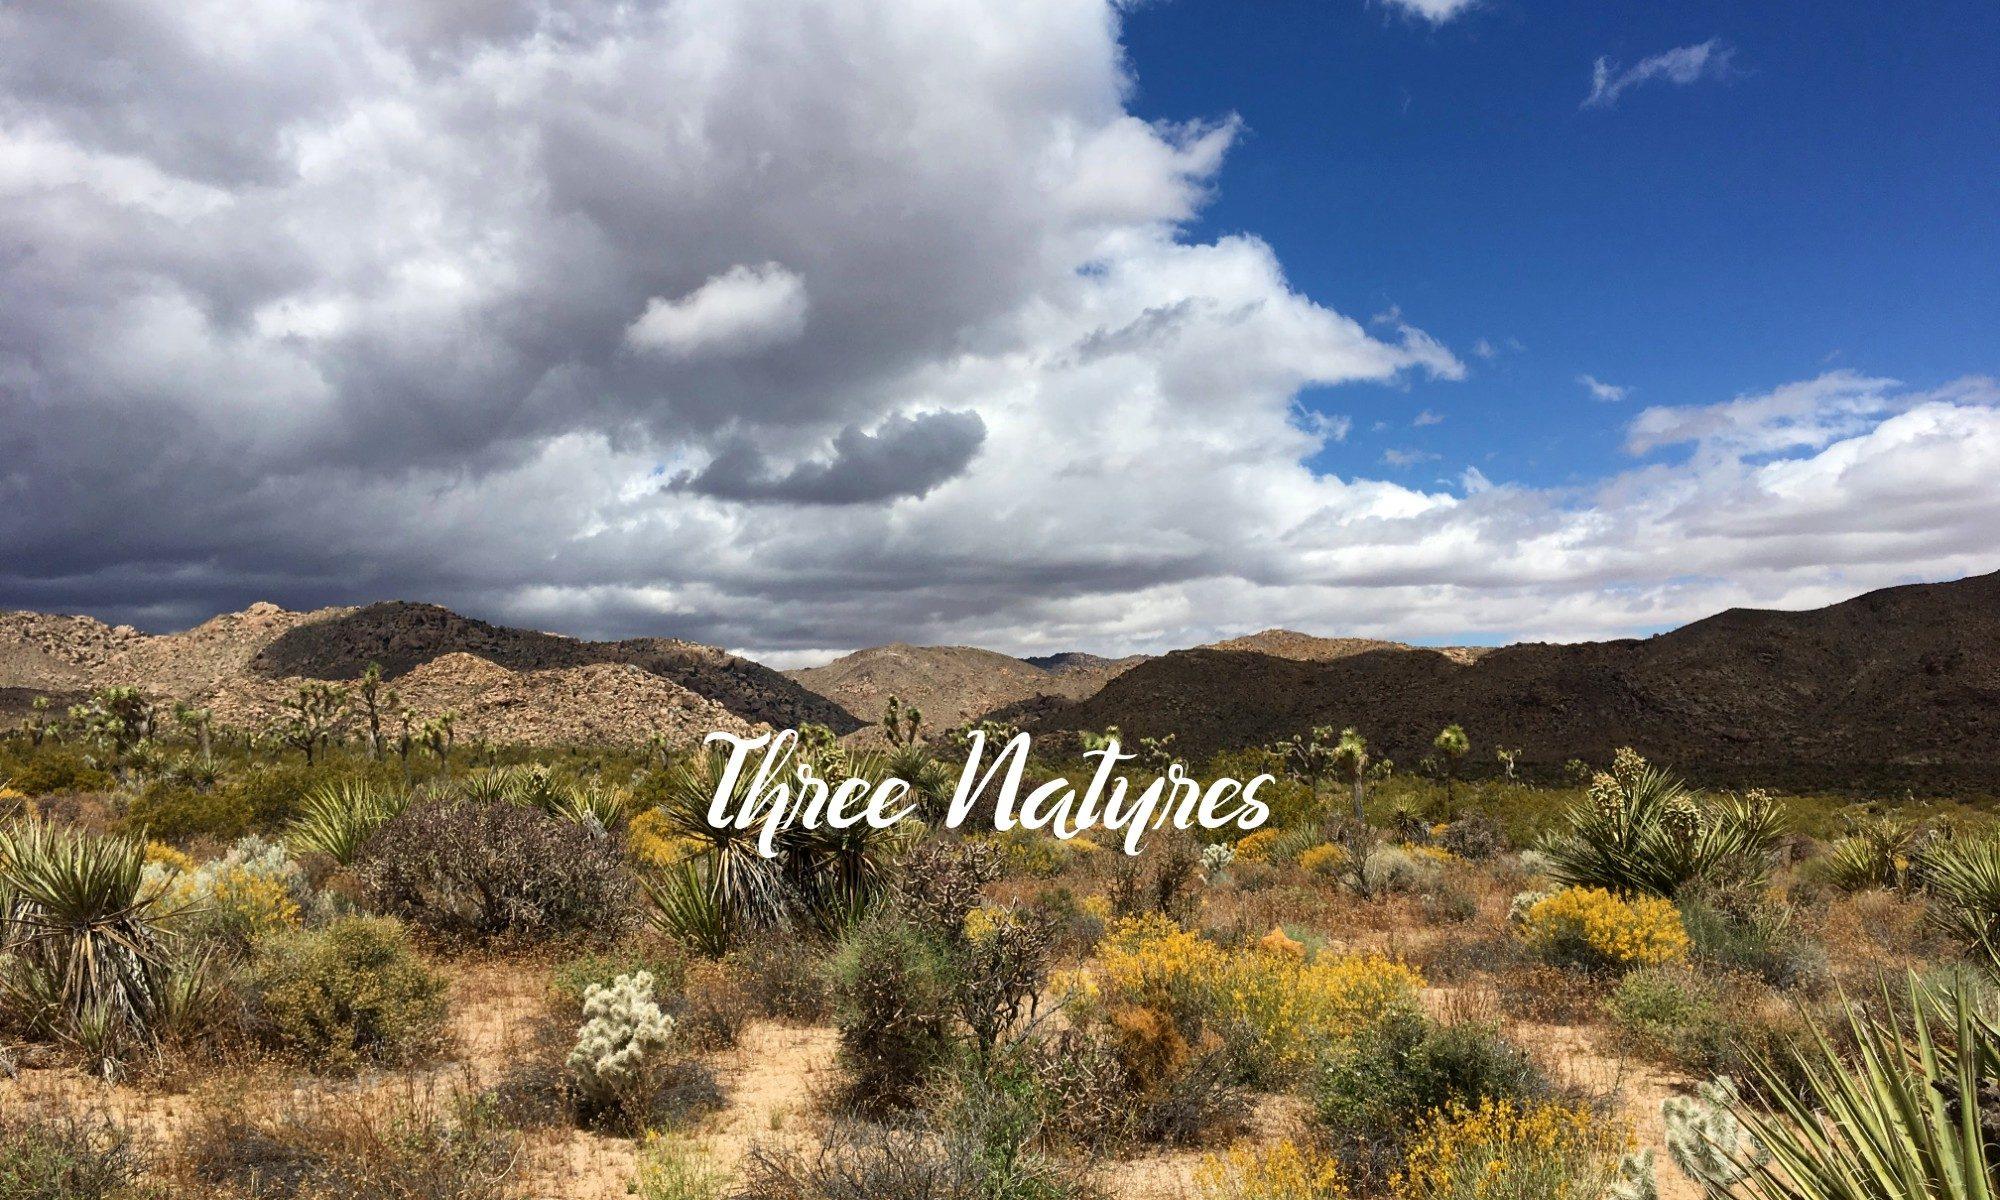 Three Natures